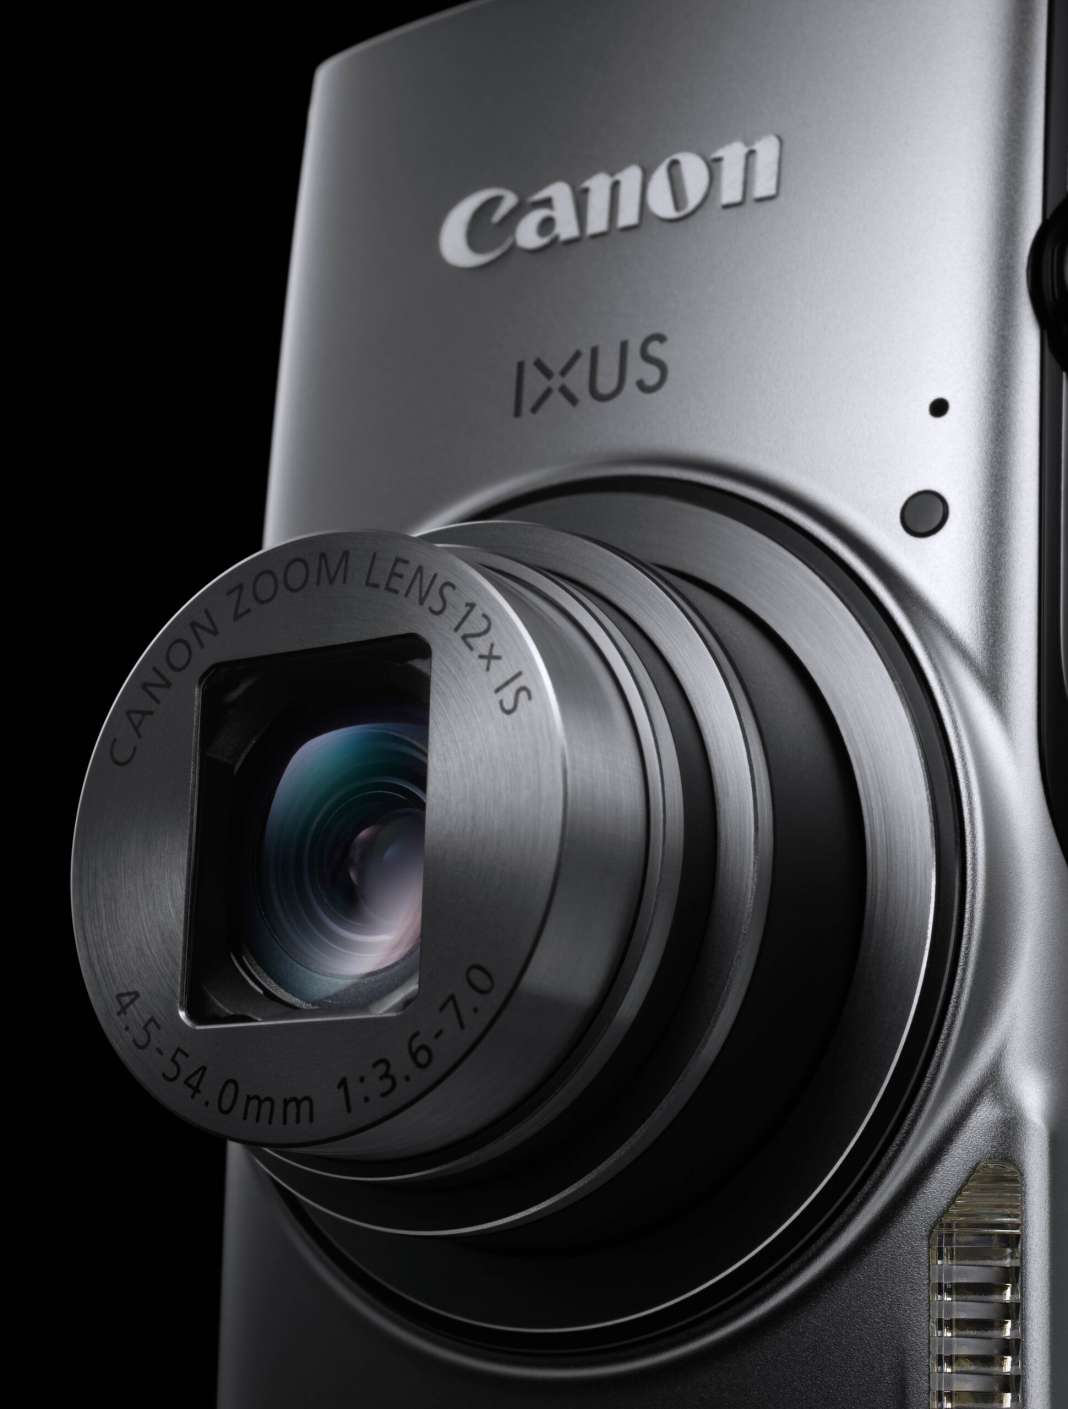 Canon Ixus 275%20hs Front Fototvhu